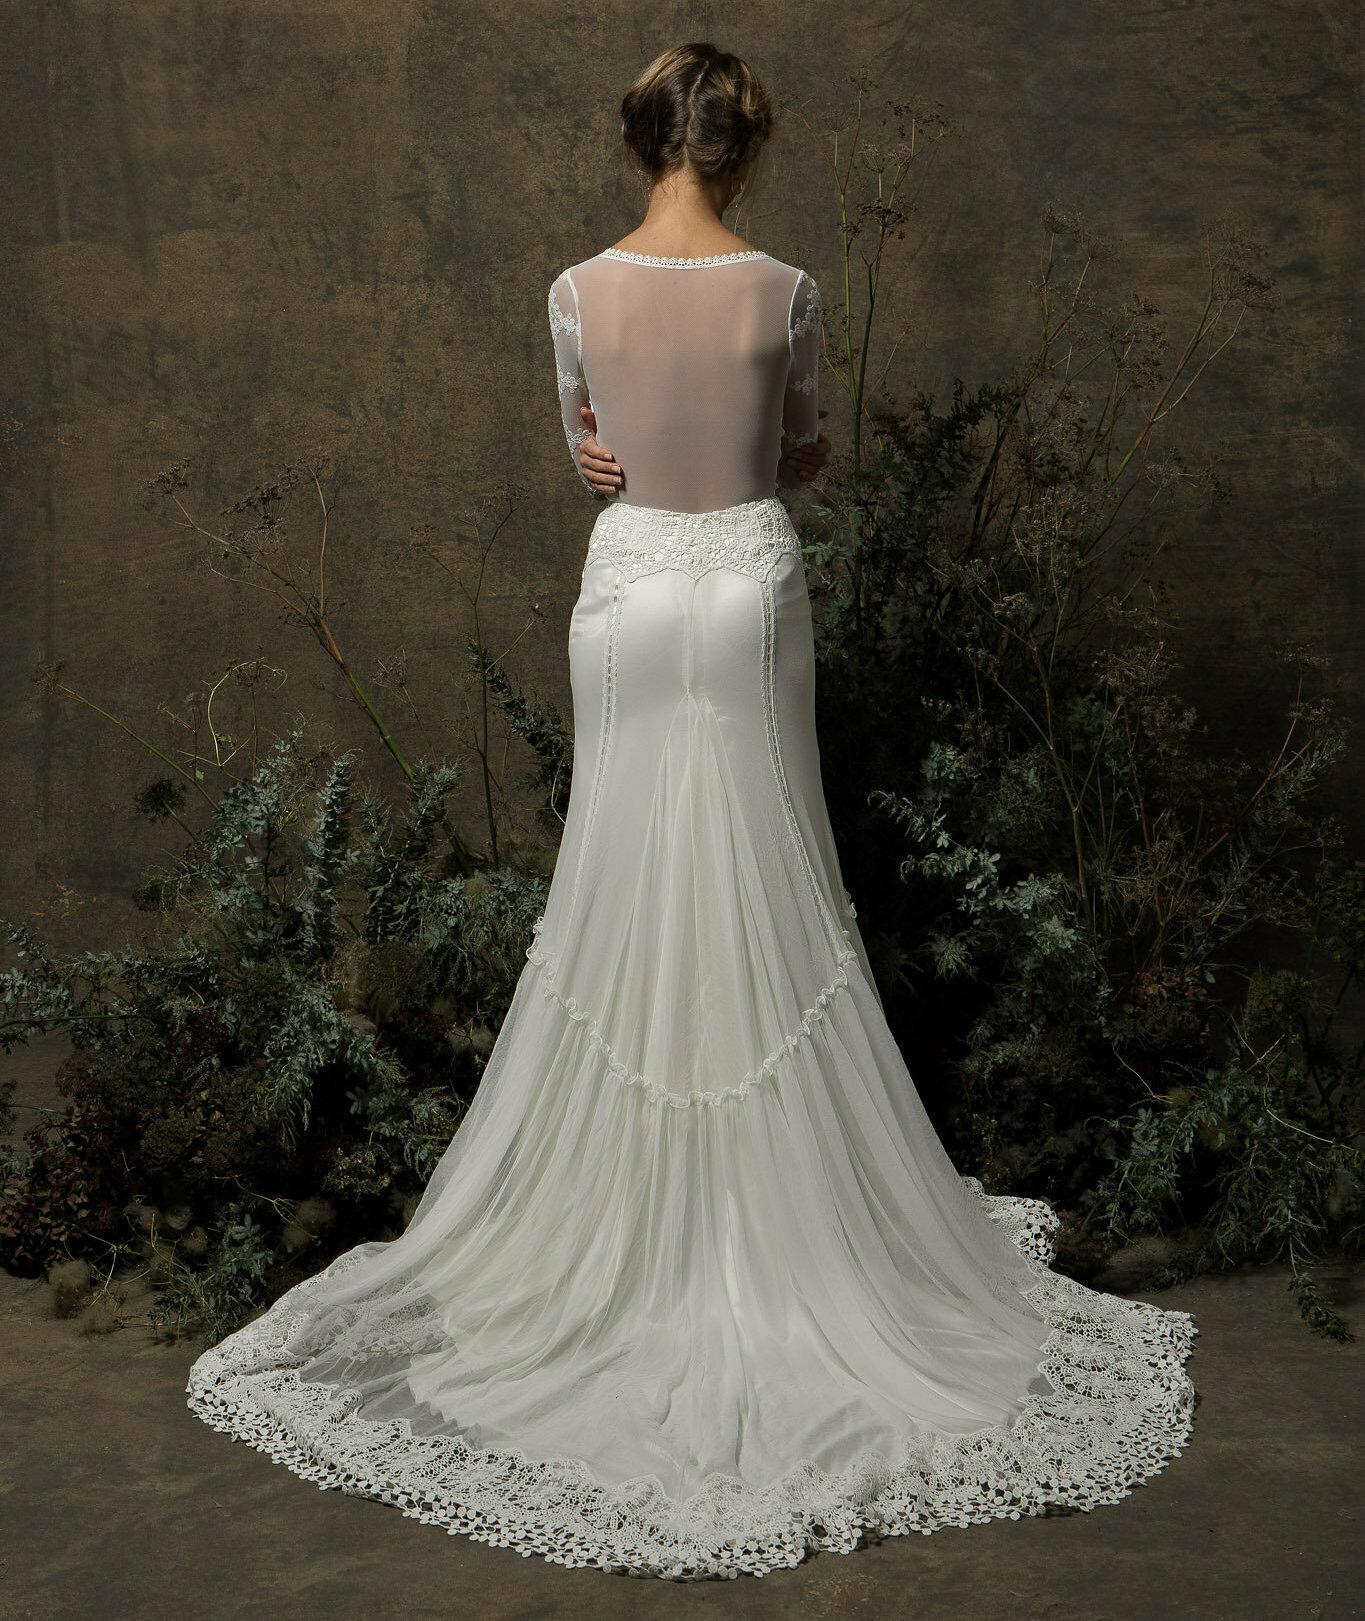 Olga-ace-wedding-dress-with-long-sleeves-crochet-boho-detailing